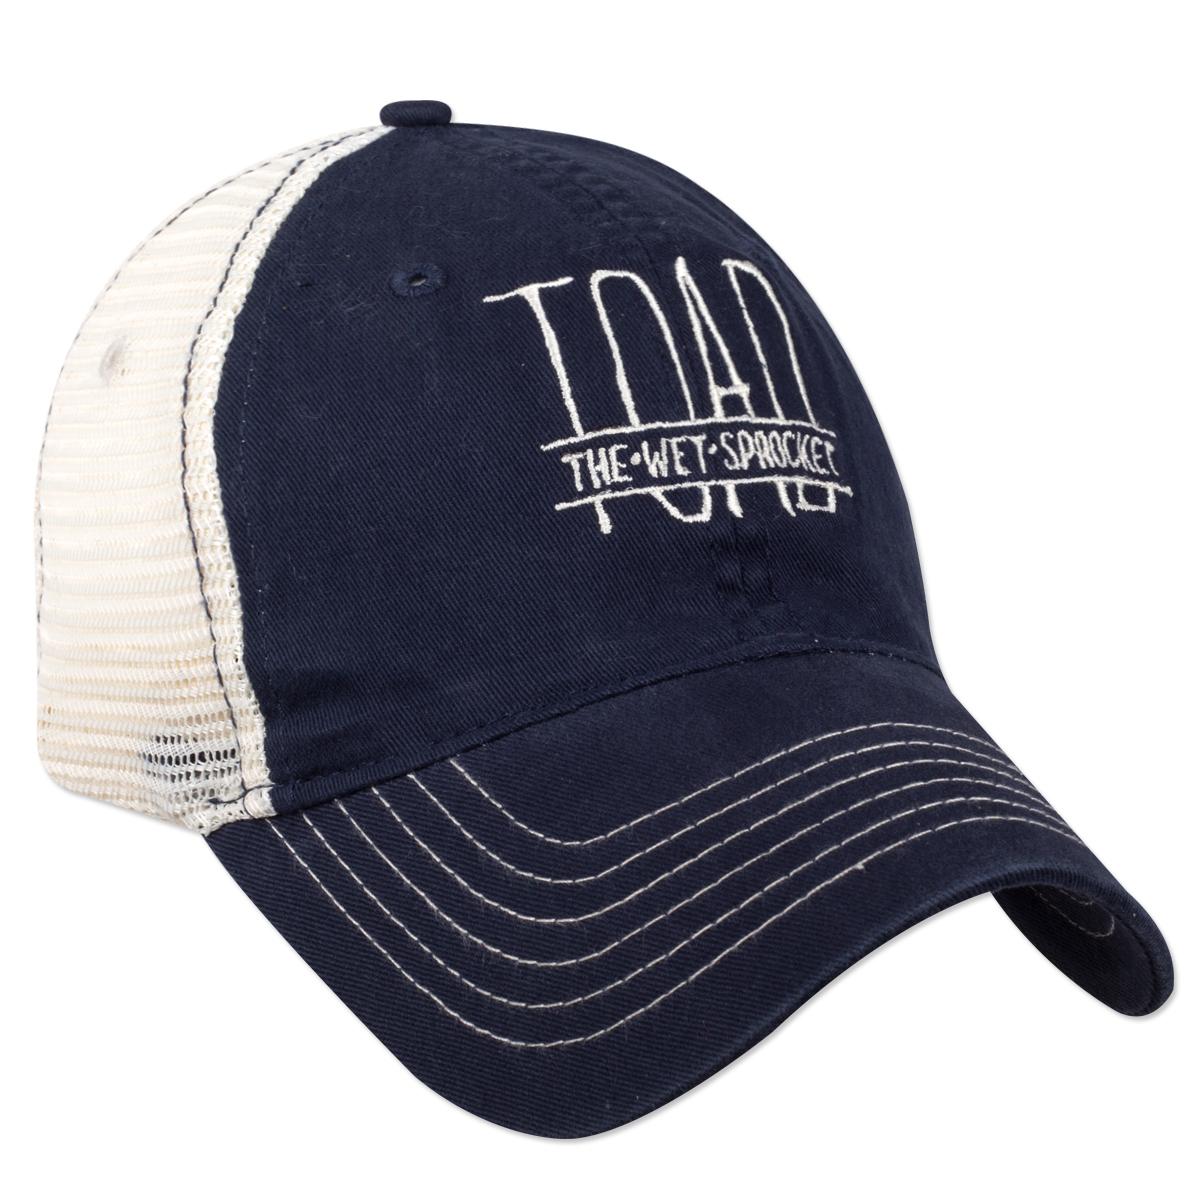 Toad The Wet Sprocket Mesh Trucker Hat